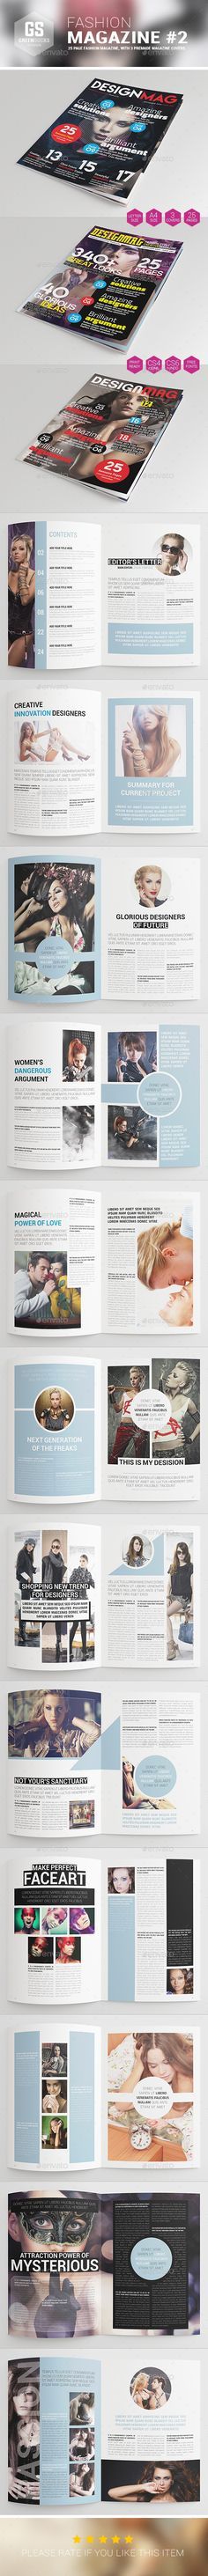 Fashion Magazine #2 — InDesign INDD #multipurpose #fashion • Available here → https://graphicriver.net/item/fashion-magazine-2/9276566?ref=pxcr